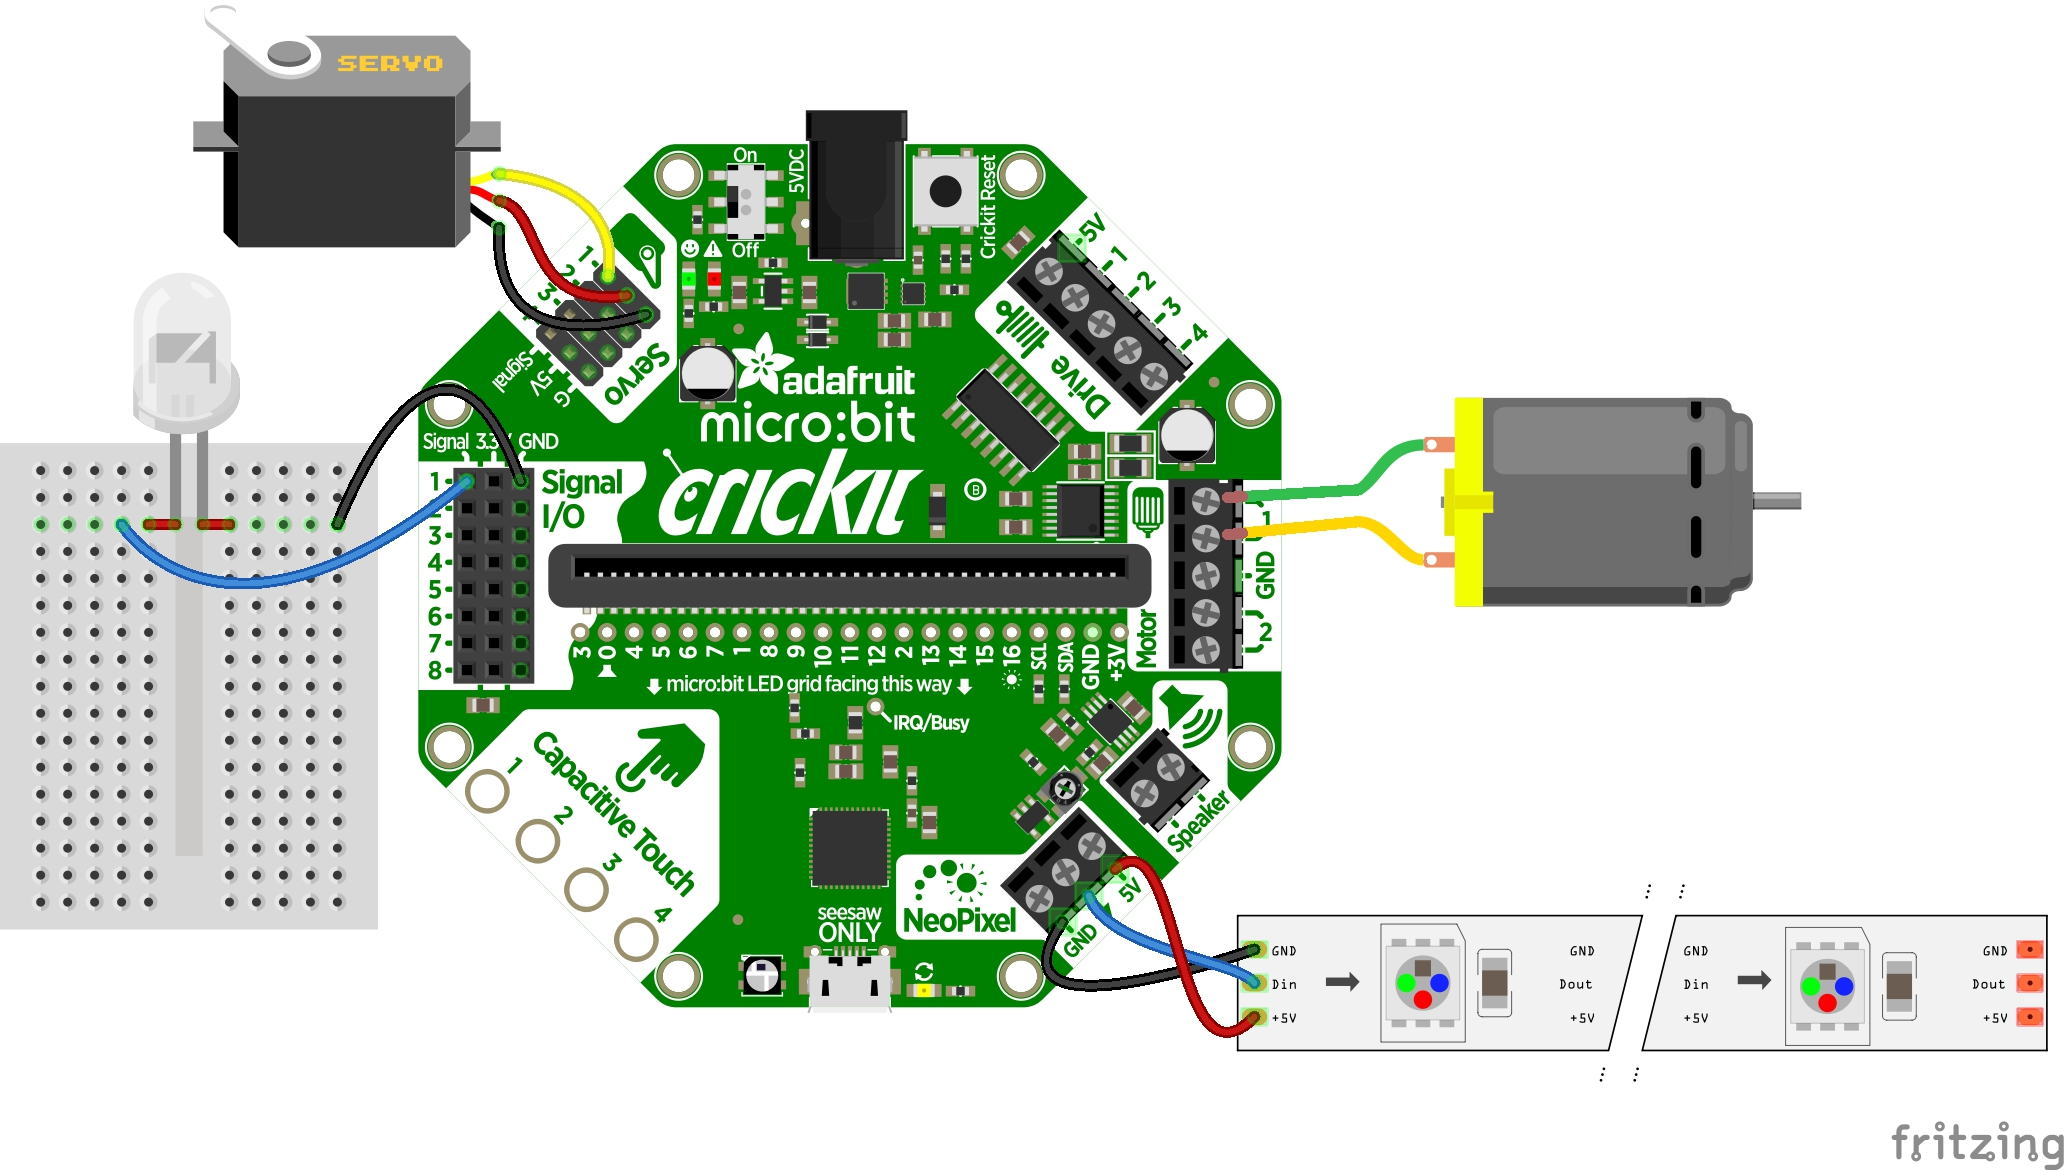 robotics___cnc_Clue-Crickit_bb.jpg